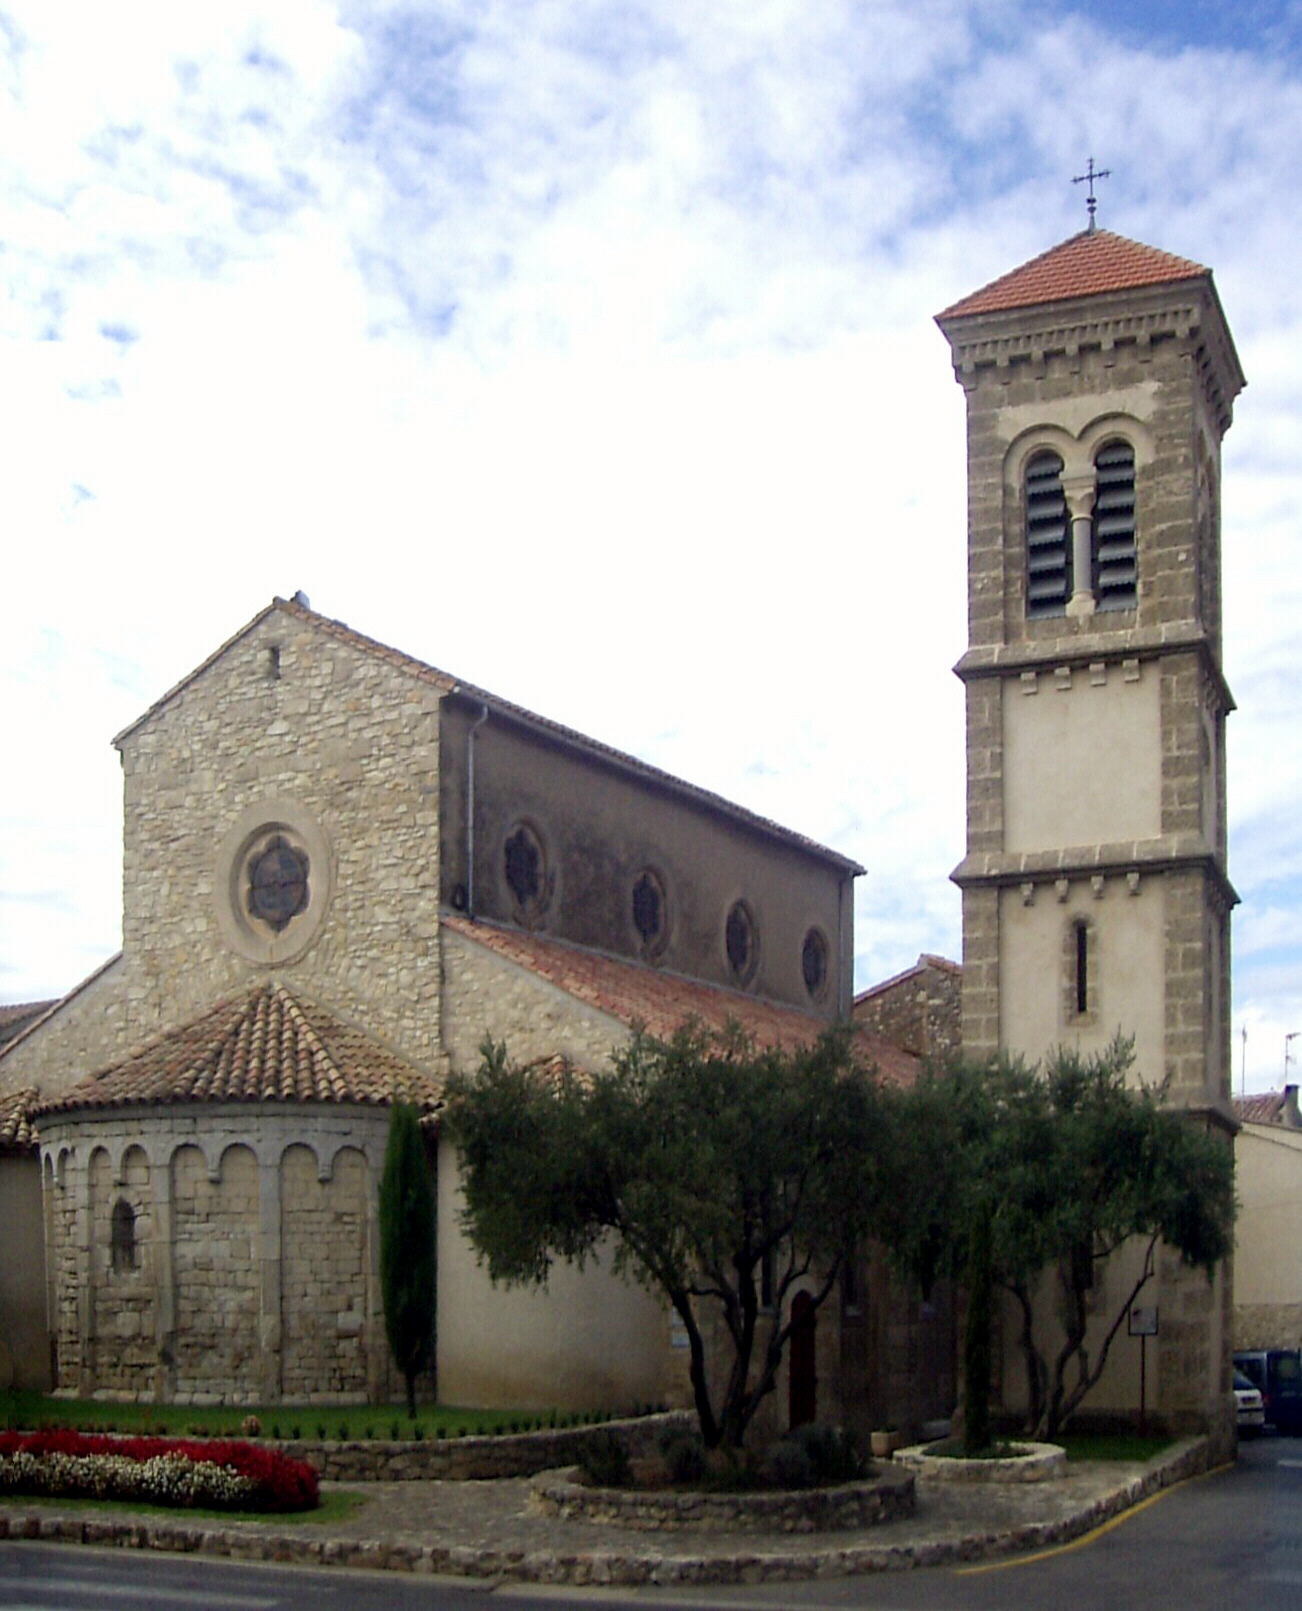 http://upload.wikimedia.org/wikipedia/commons/5/58/Vinassan,_Eglise_Saint-Martin.jpg